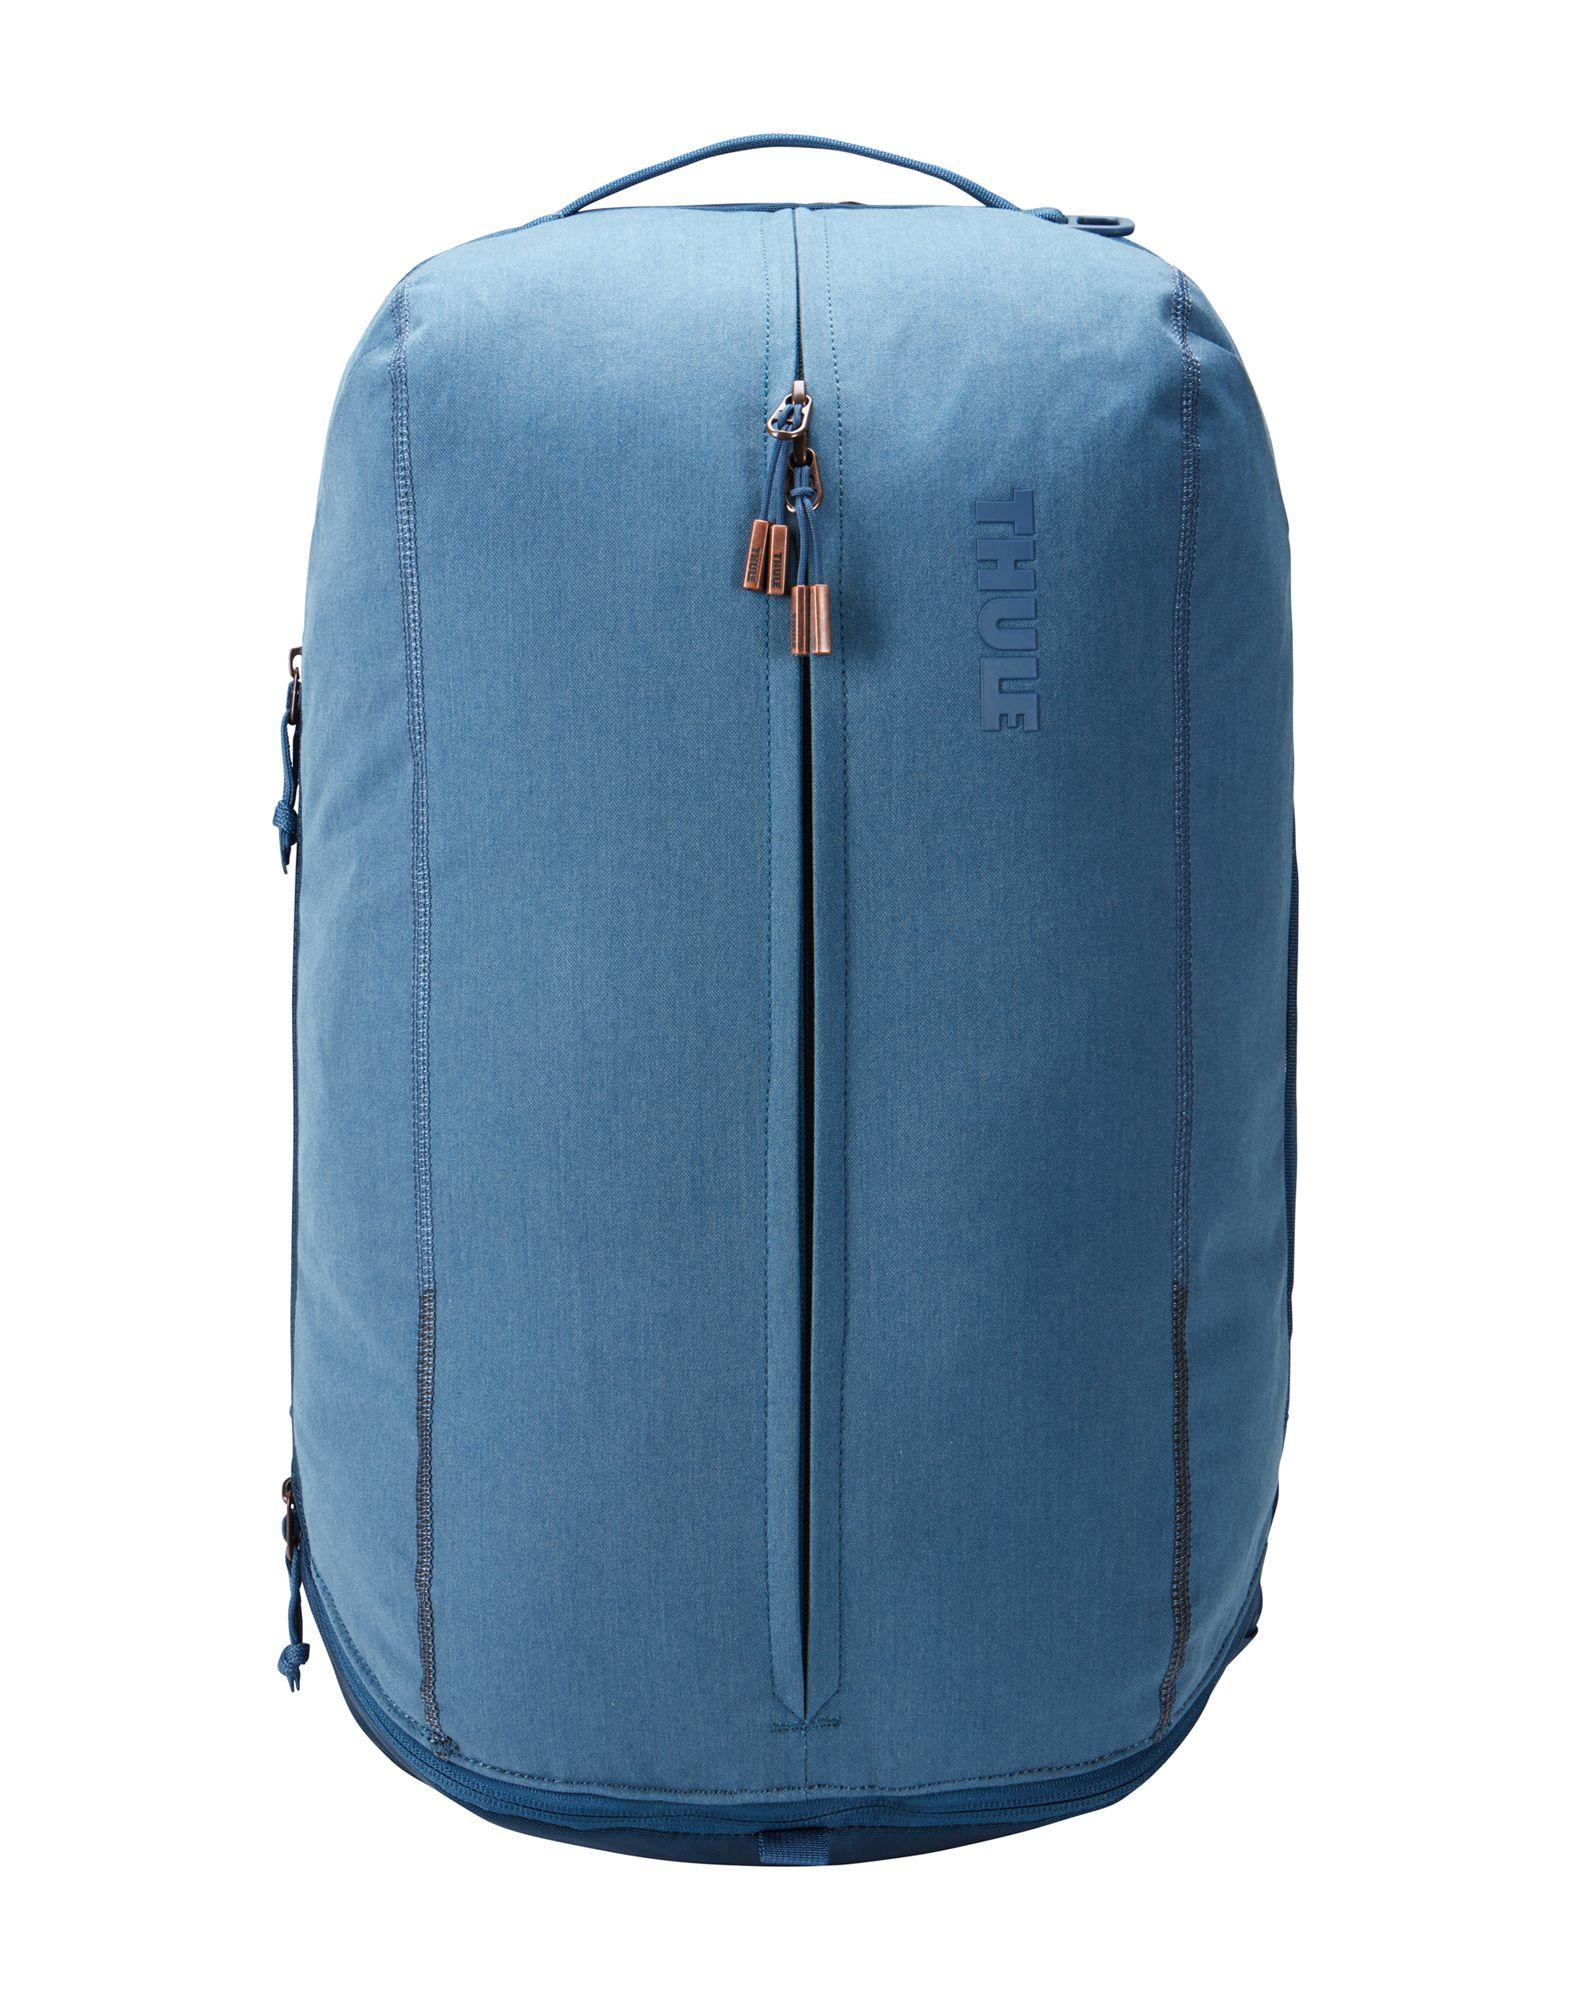 Zaini & Marsupi Thule® Vea Backpack 21L Light - Uomo - Acquista online su